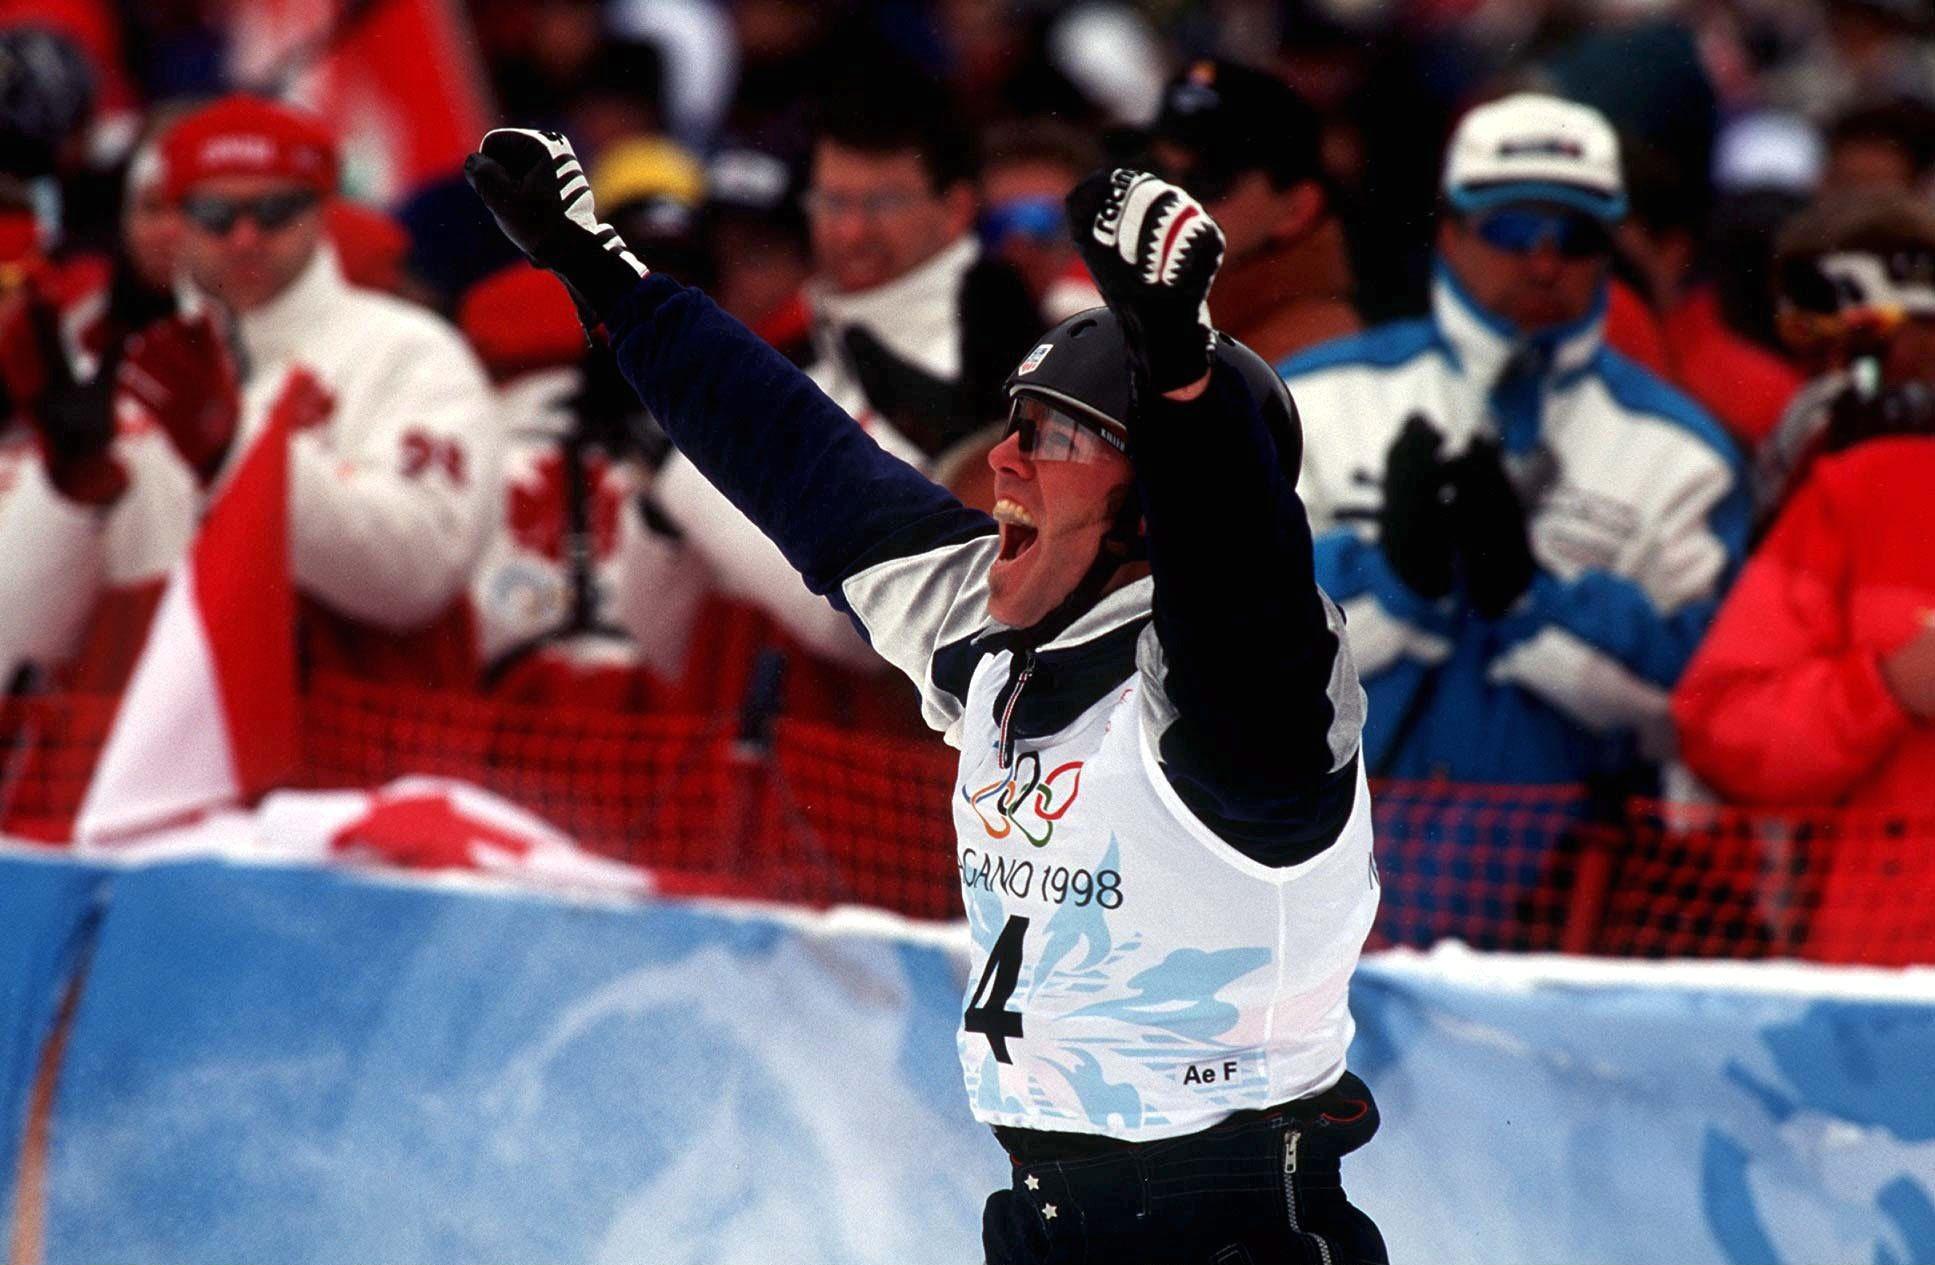 Eric Bergoust won Olympic gold at Nagano 1998 ©Getty Images